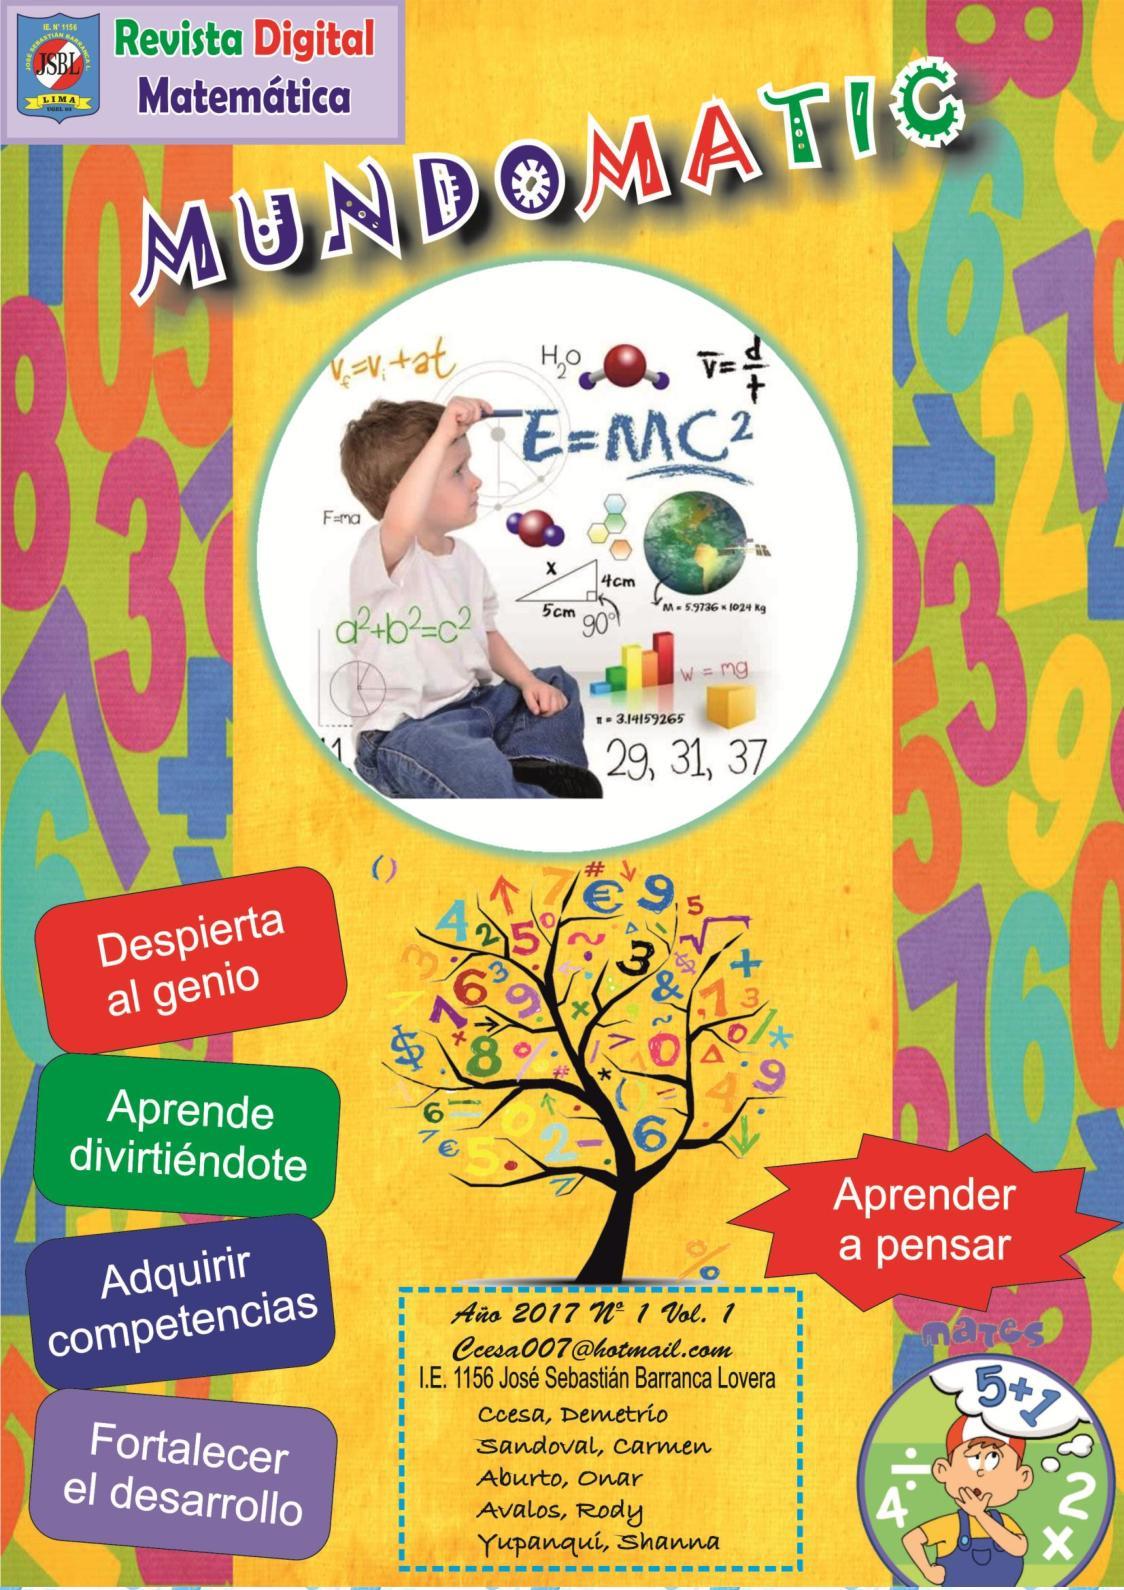 Revista Digital Matematica Mundomatic Demetrio Ccesa Rayme 2017